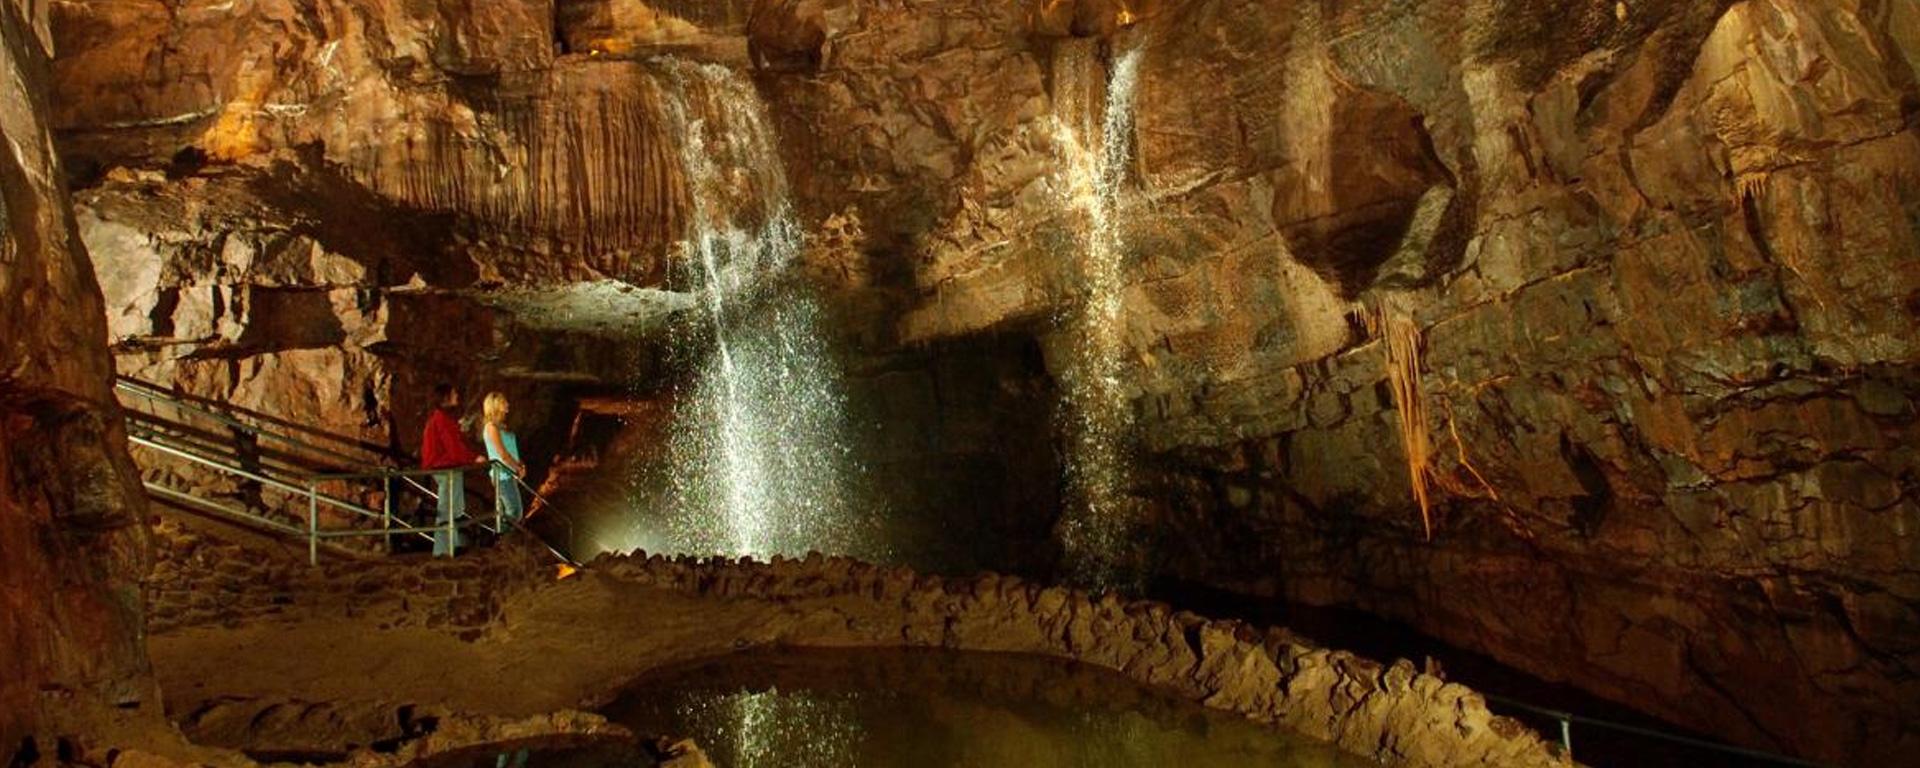 Dan-yr-Ogof Cave - Abercrave, Wales